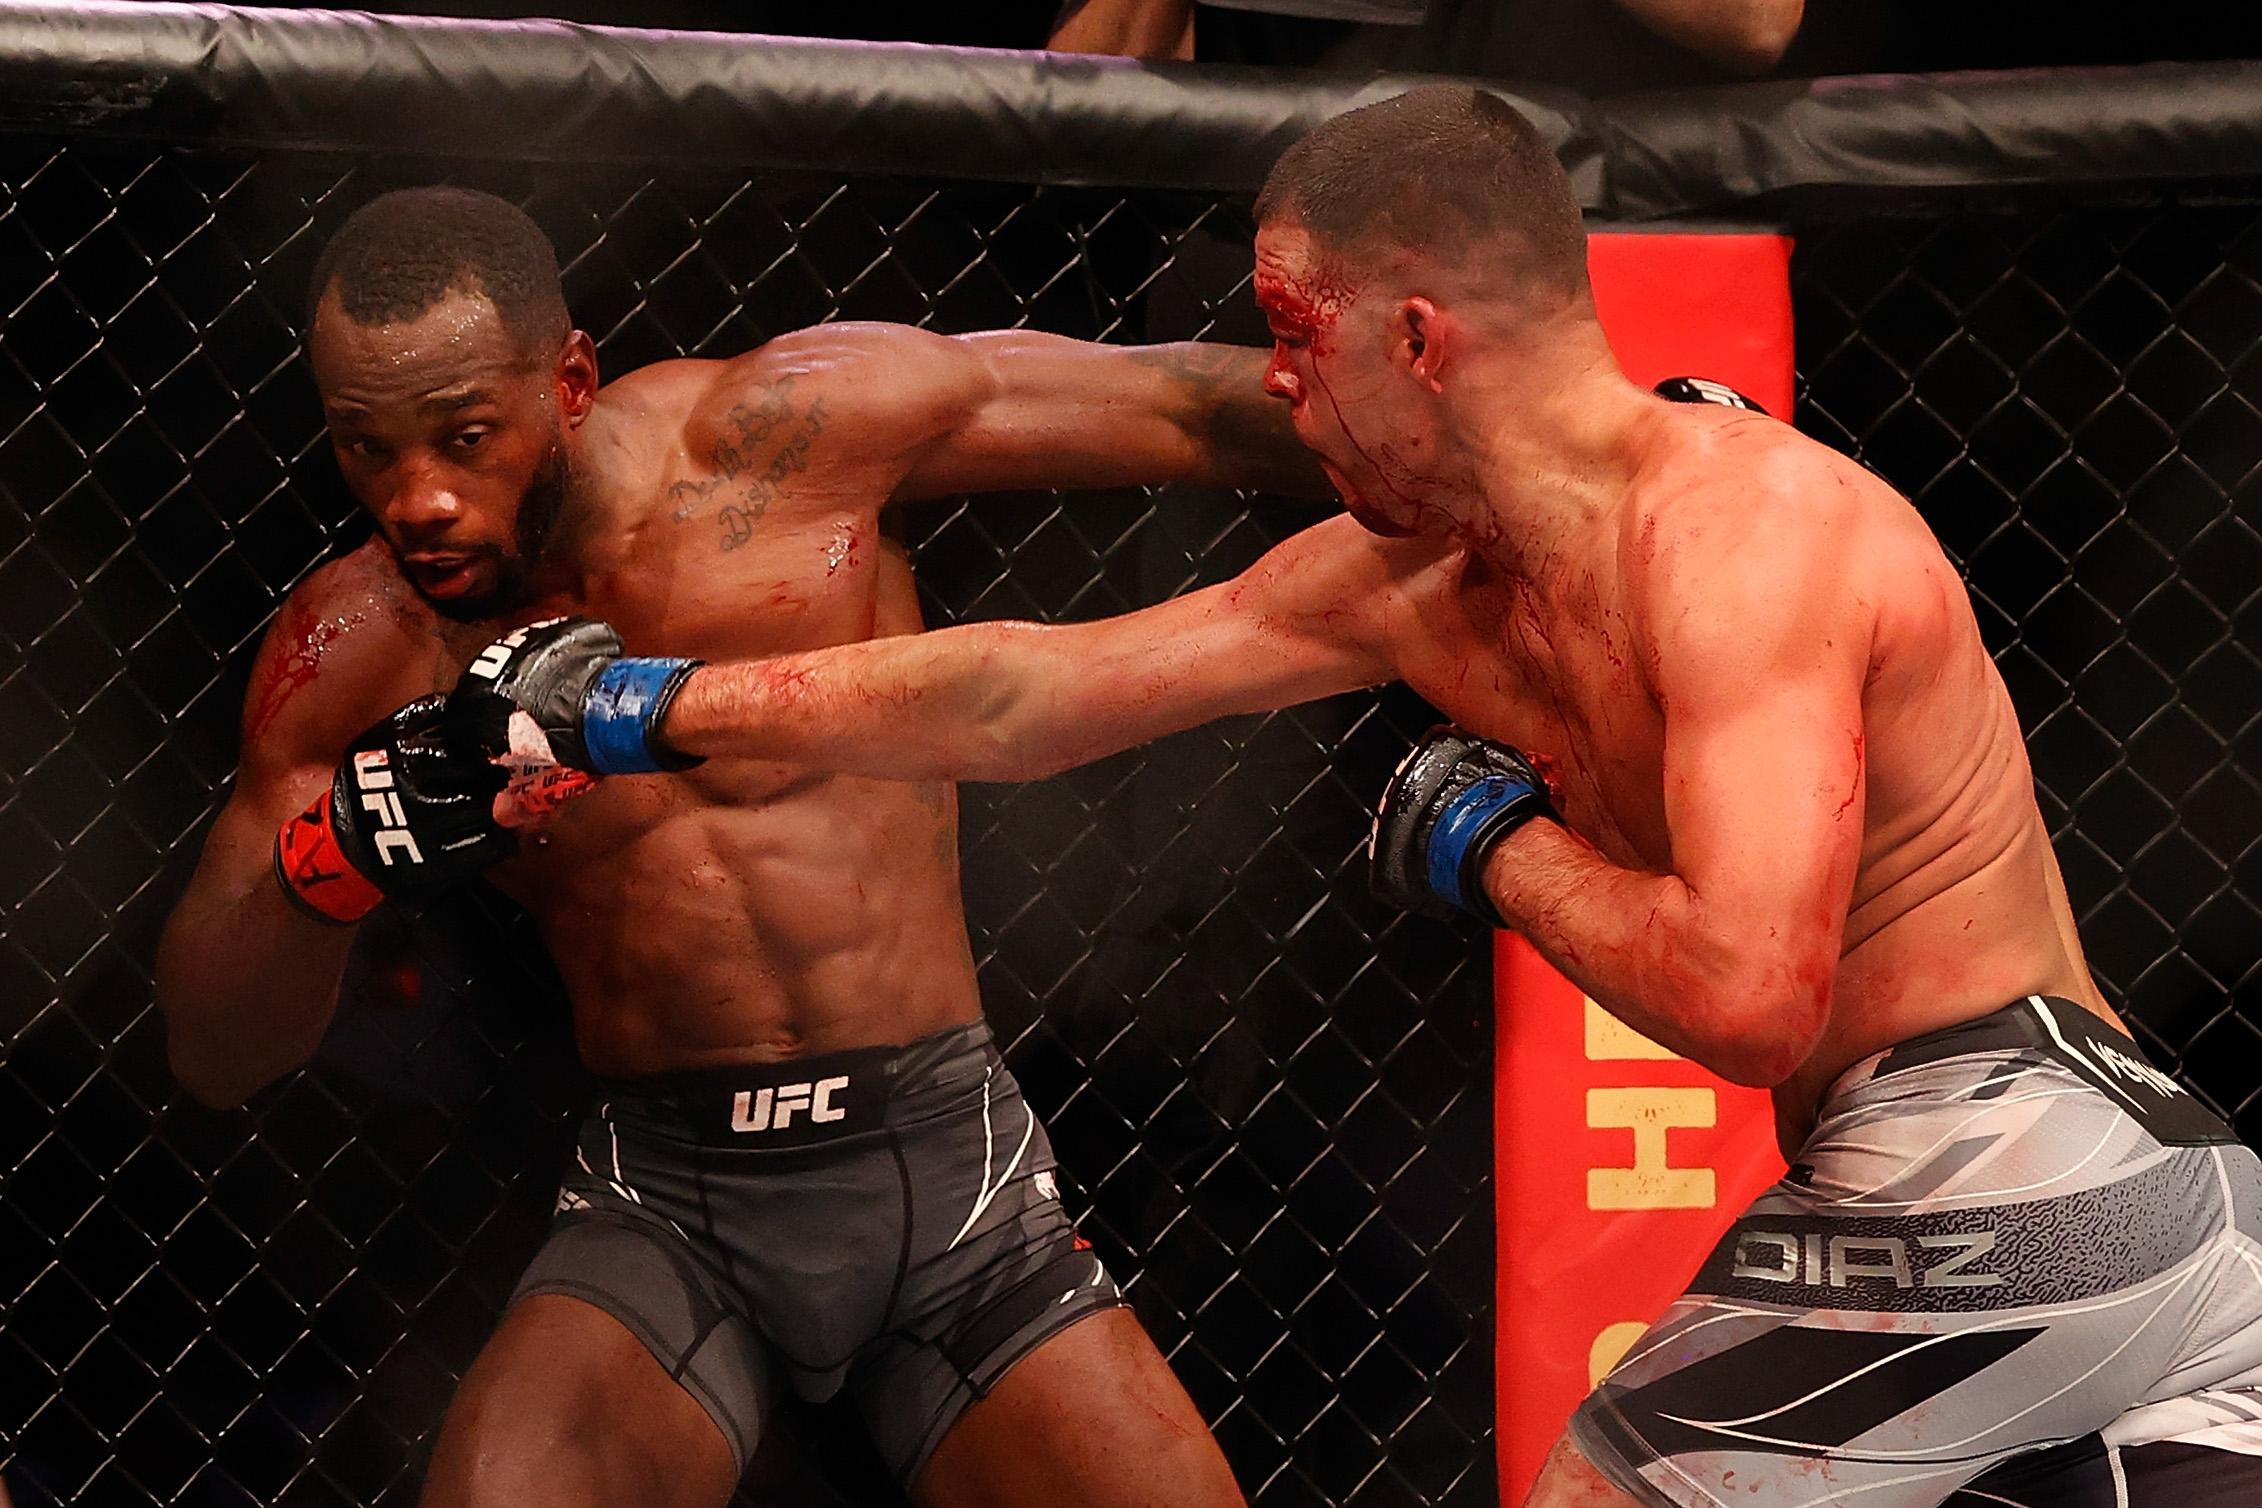 Leon Edwards vs Nate Diaz at UFC 263: Adesanya vs. Vettori 2